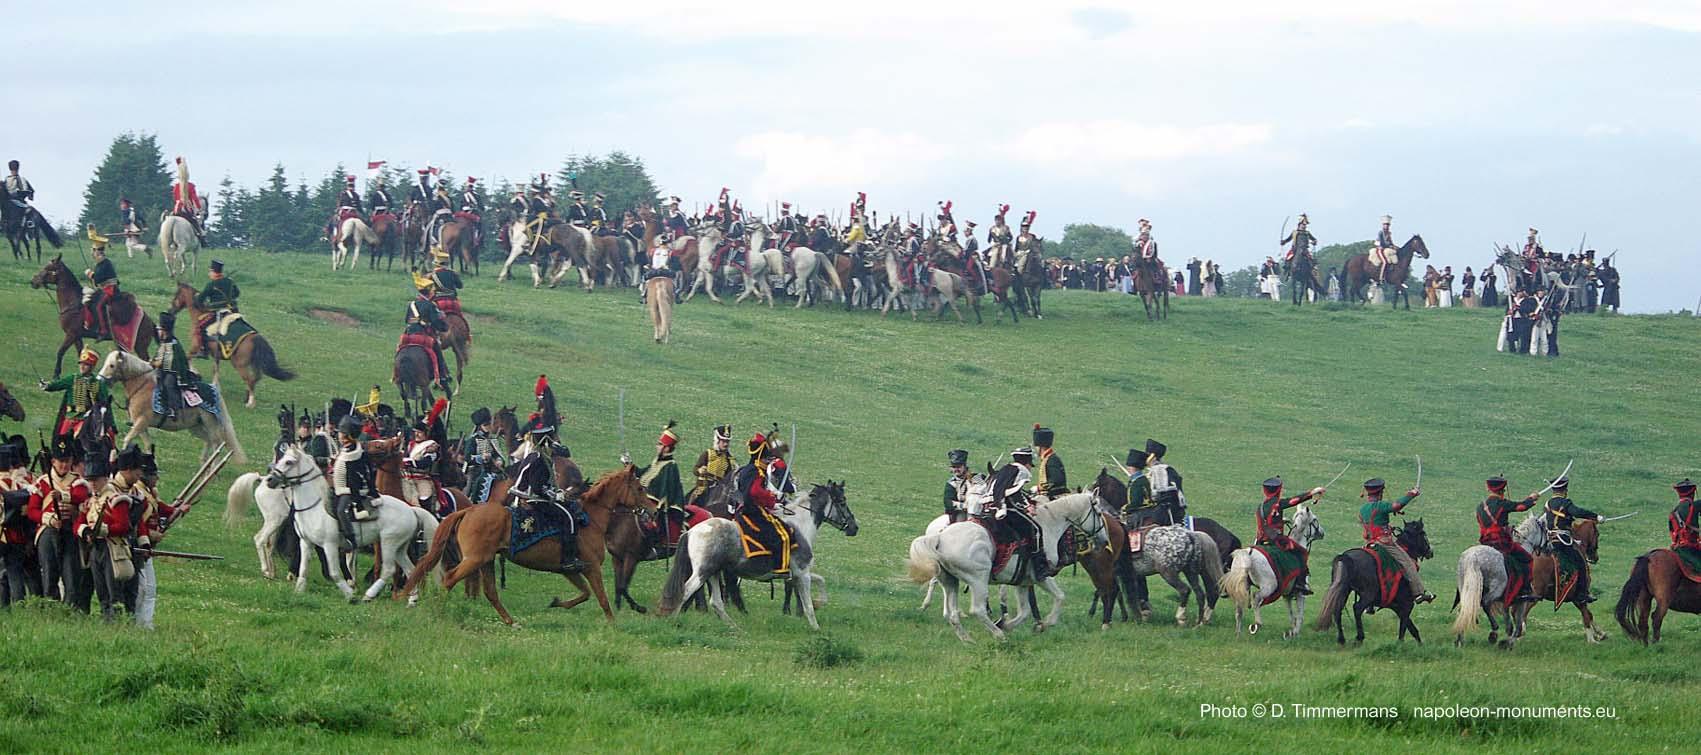 http://napoleon-monuments.eu/Napoleon1er/images/100619_410b.jpg